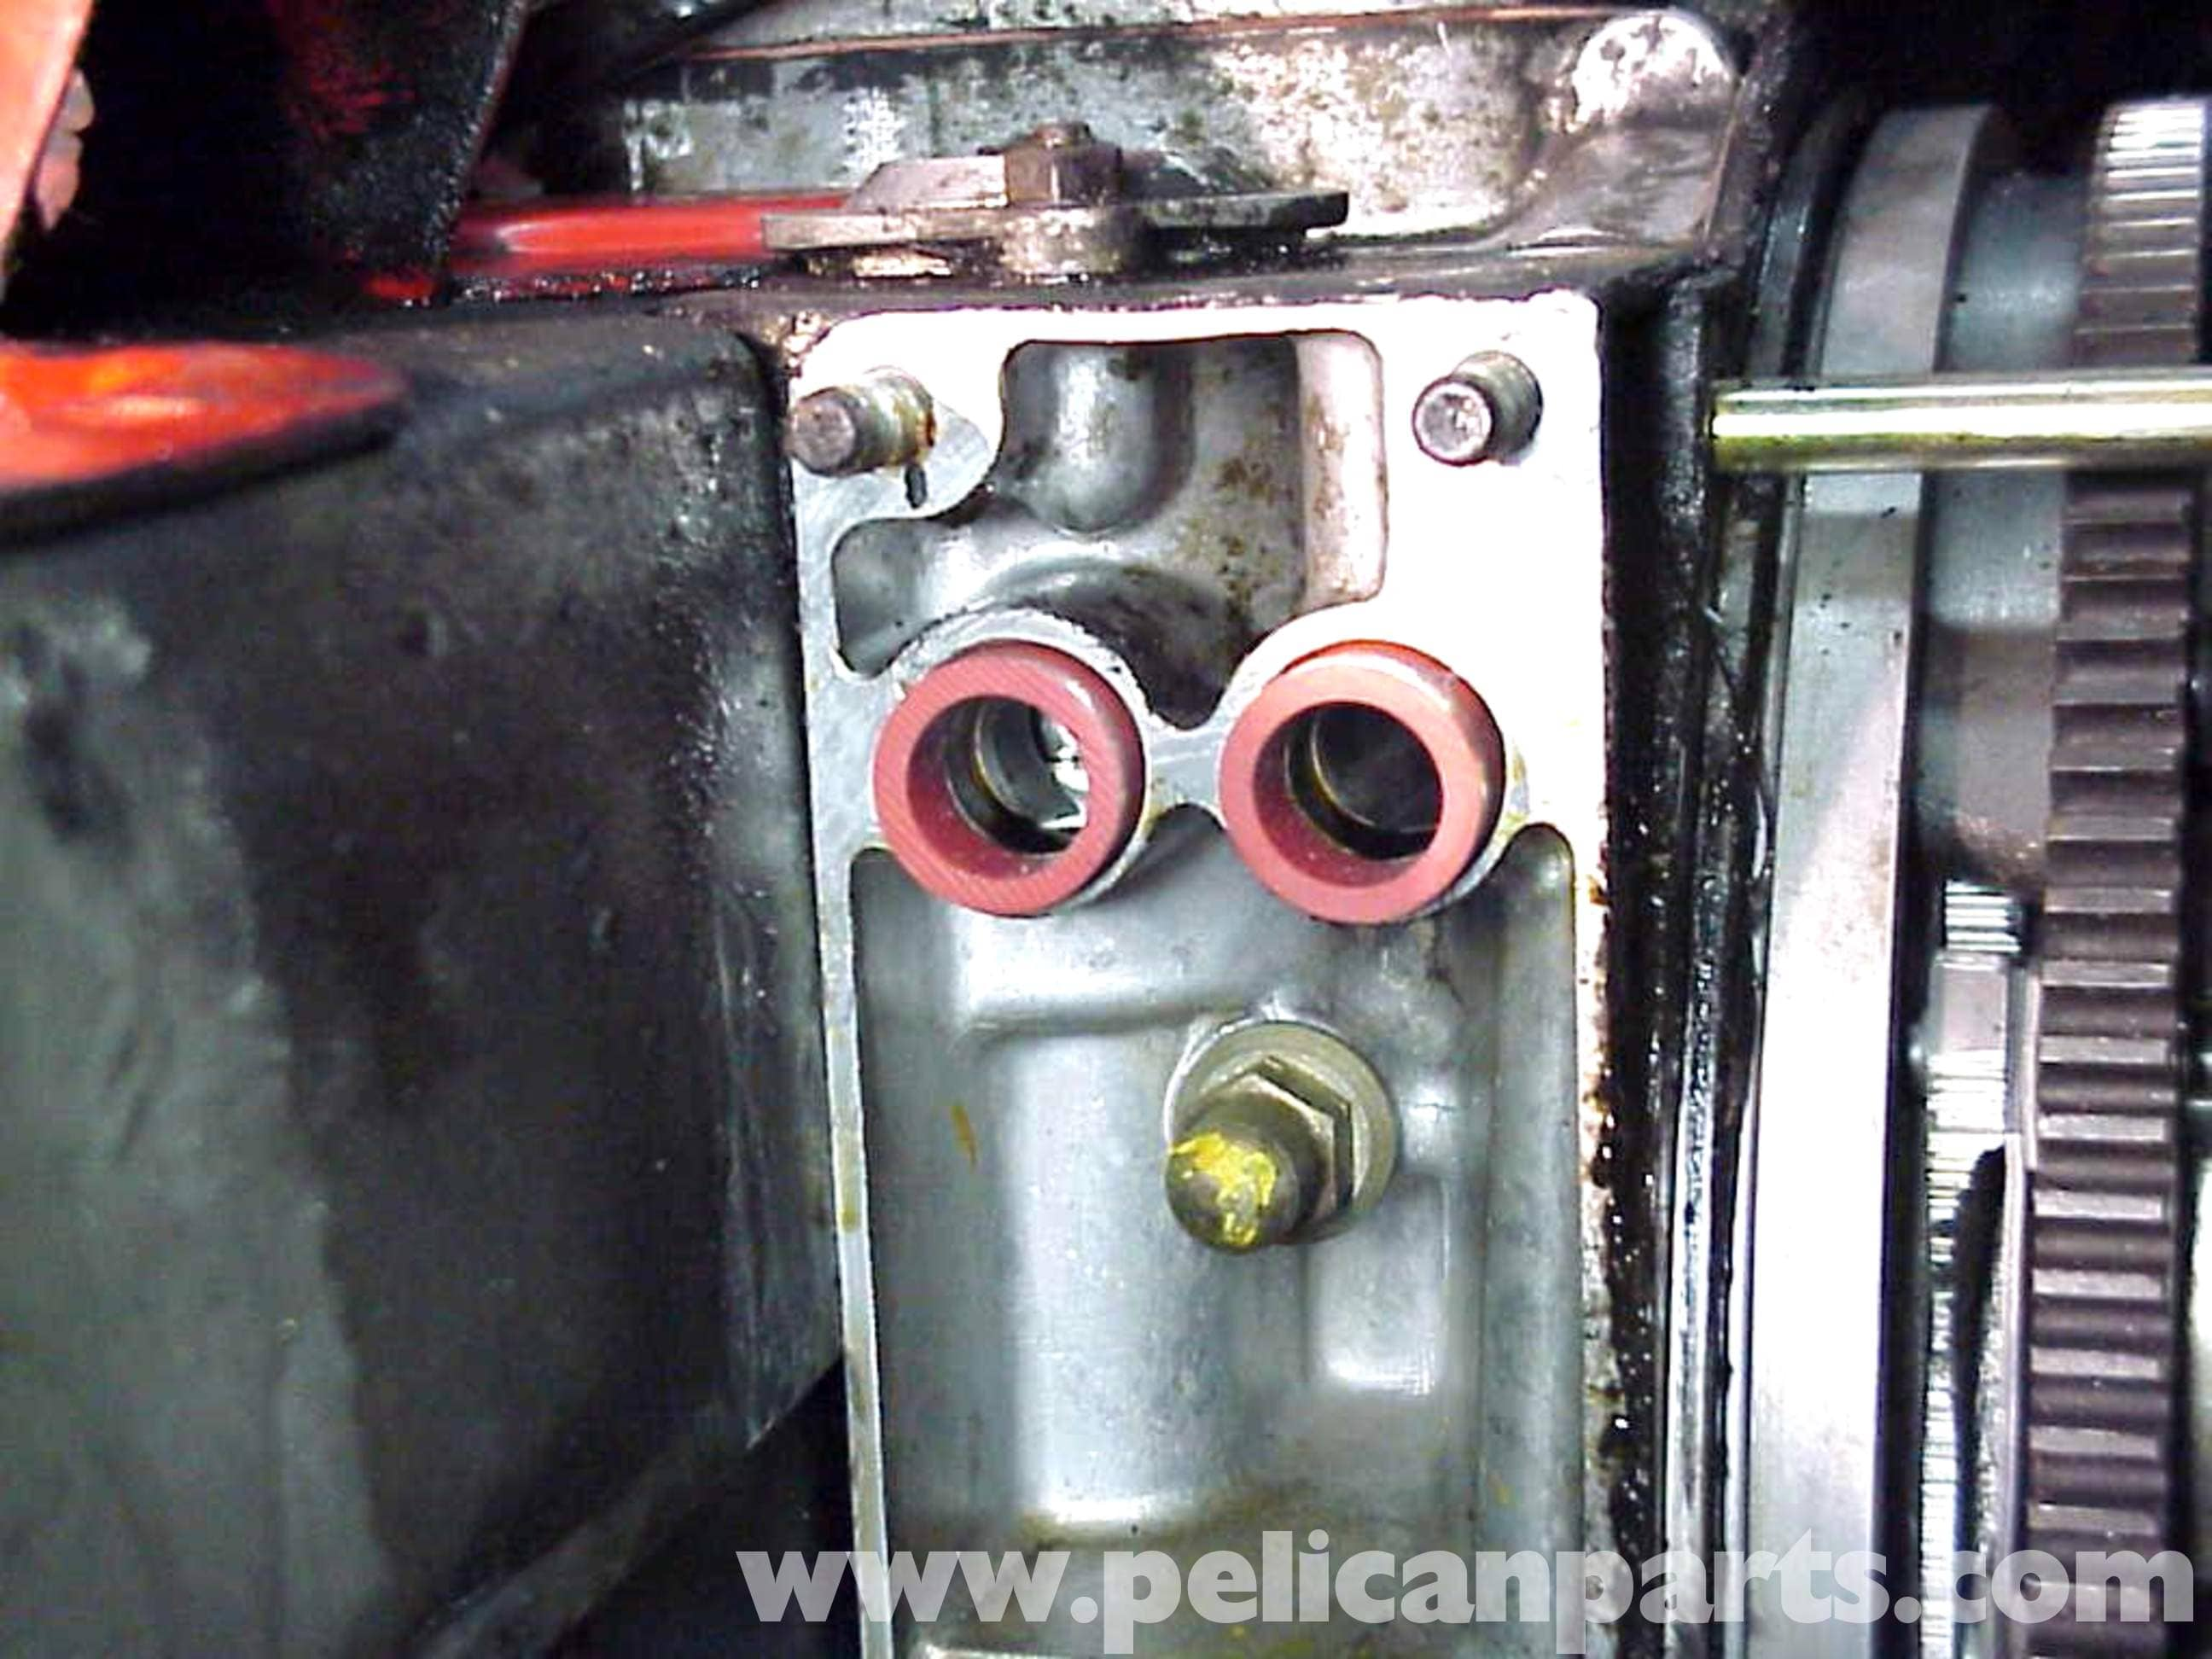 Porsche 911 Fixing Common Oil Leaks 1965 89 930 Turbo 1986 Flat 6 Engine Diagram Large Image Extra